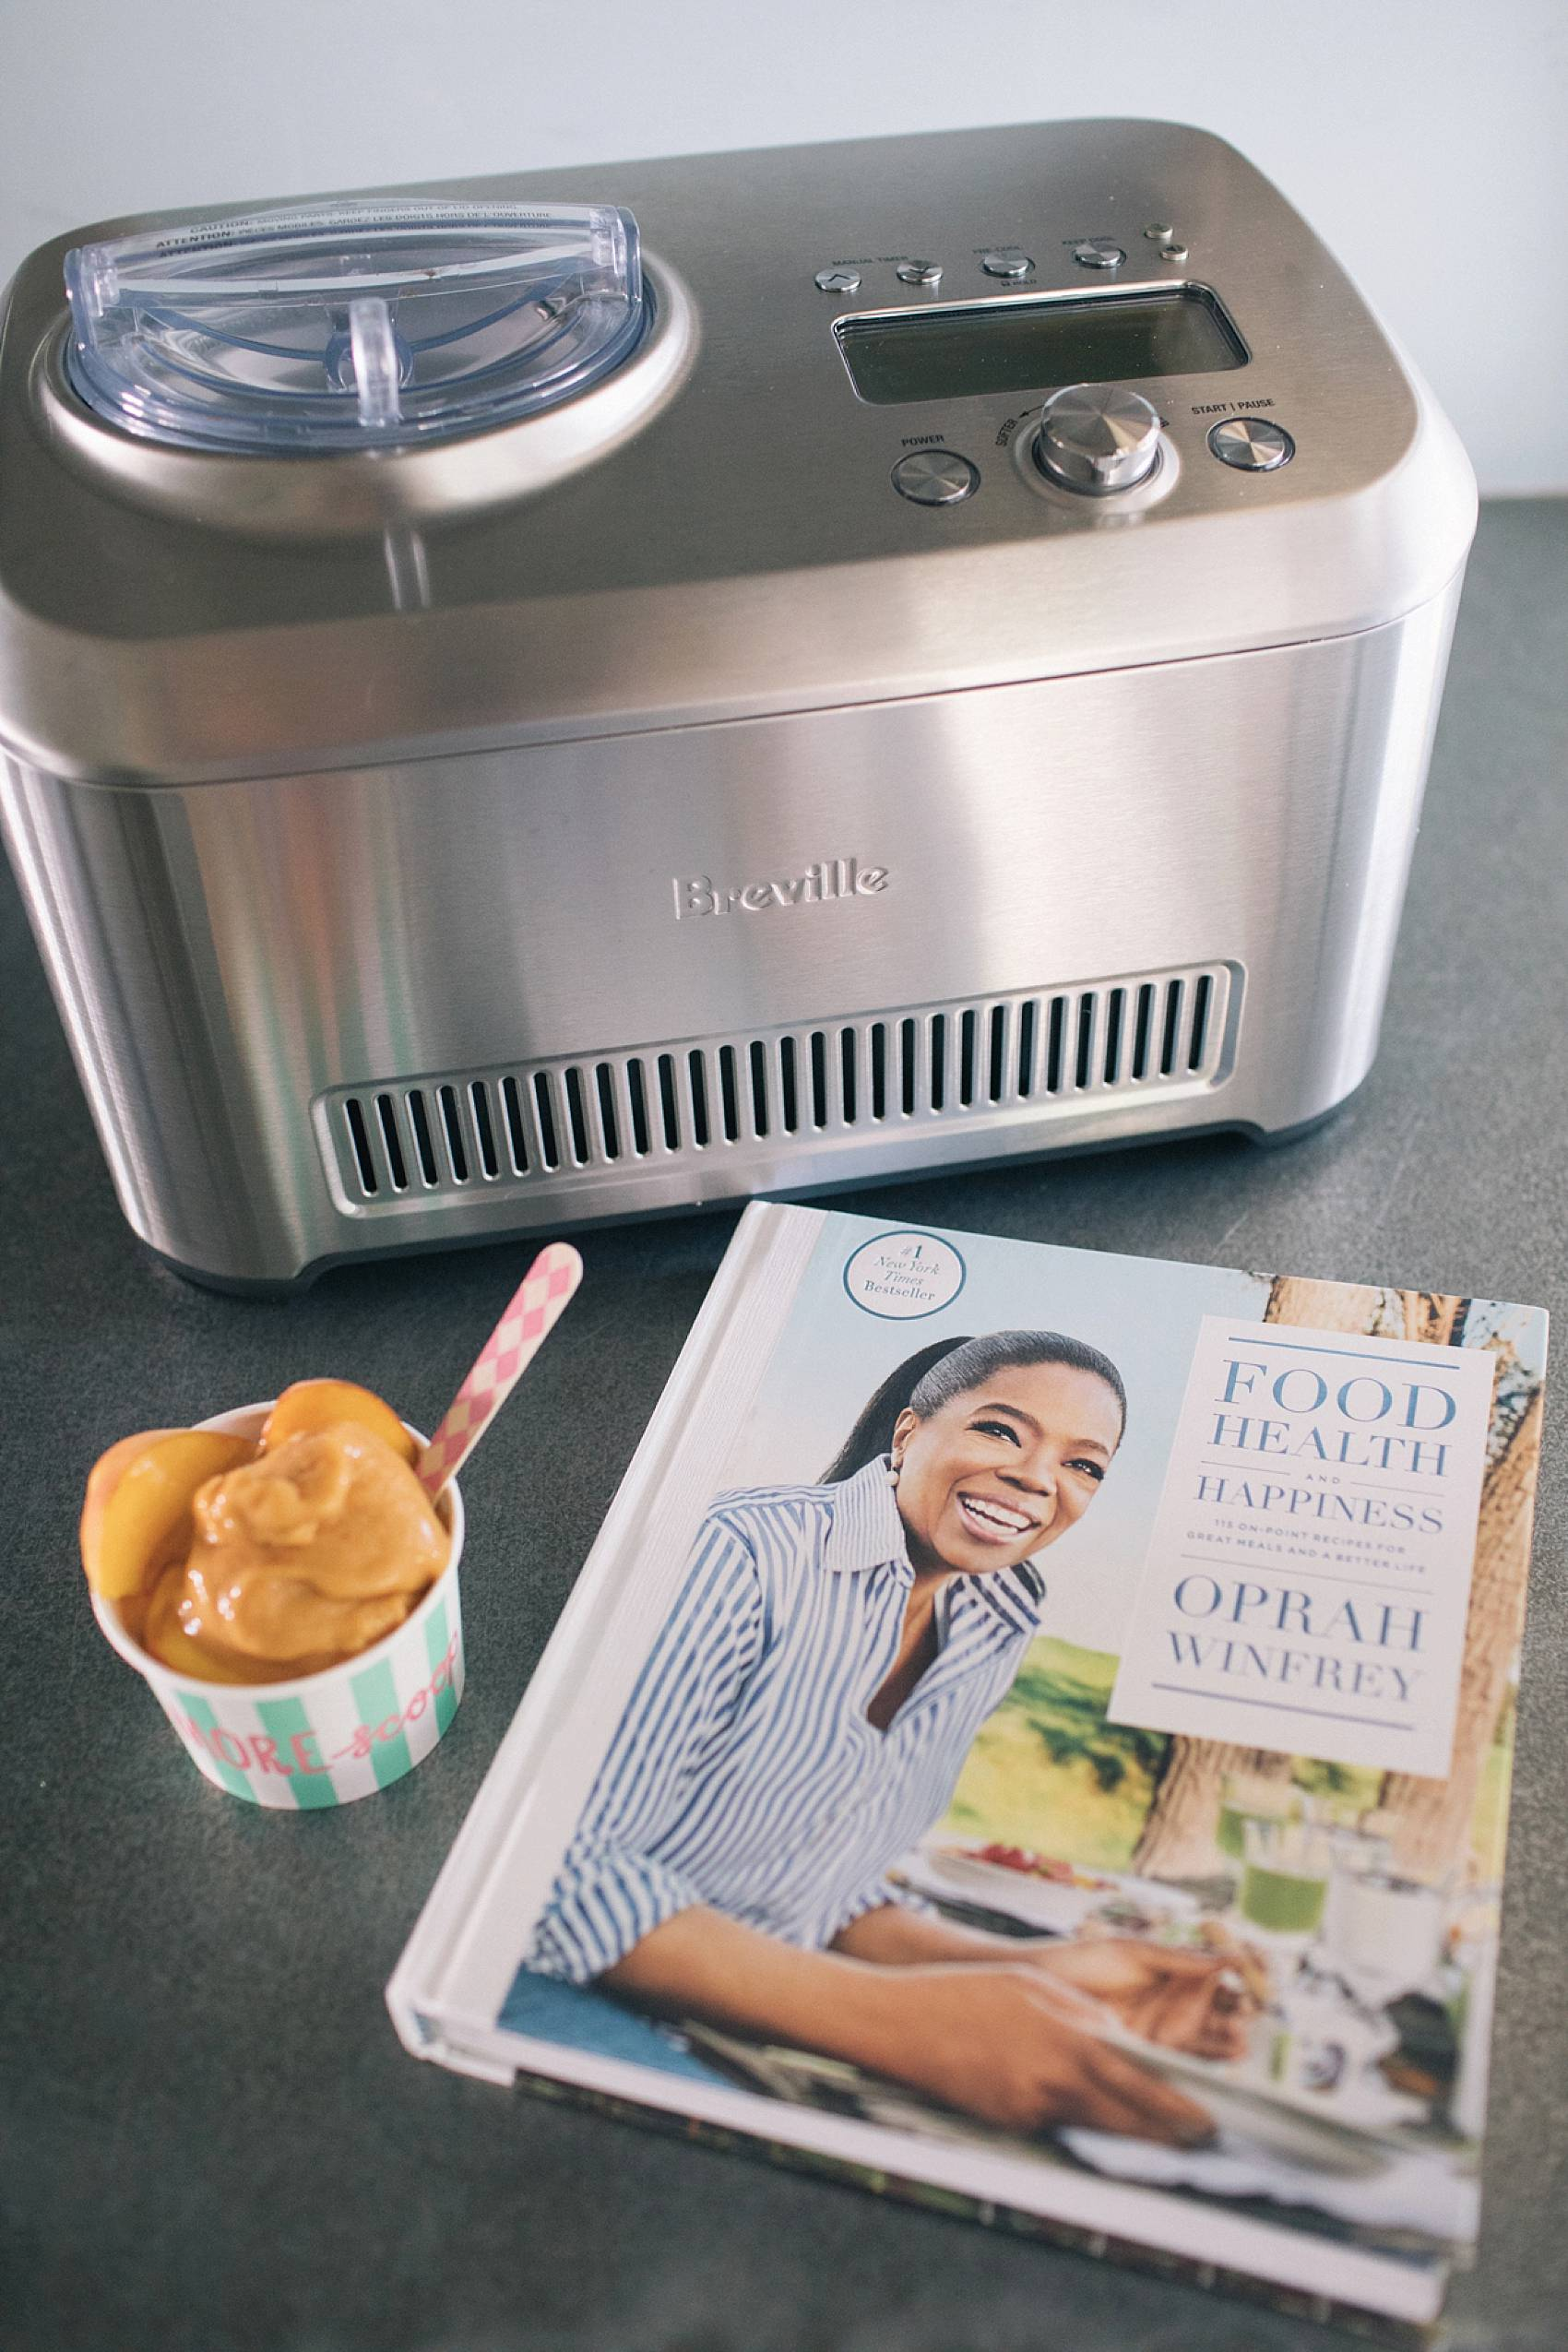 breville smart scoop ice cream maker with Oprah Winfrey cook book